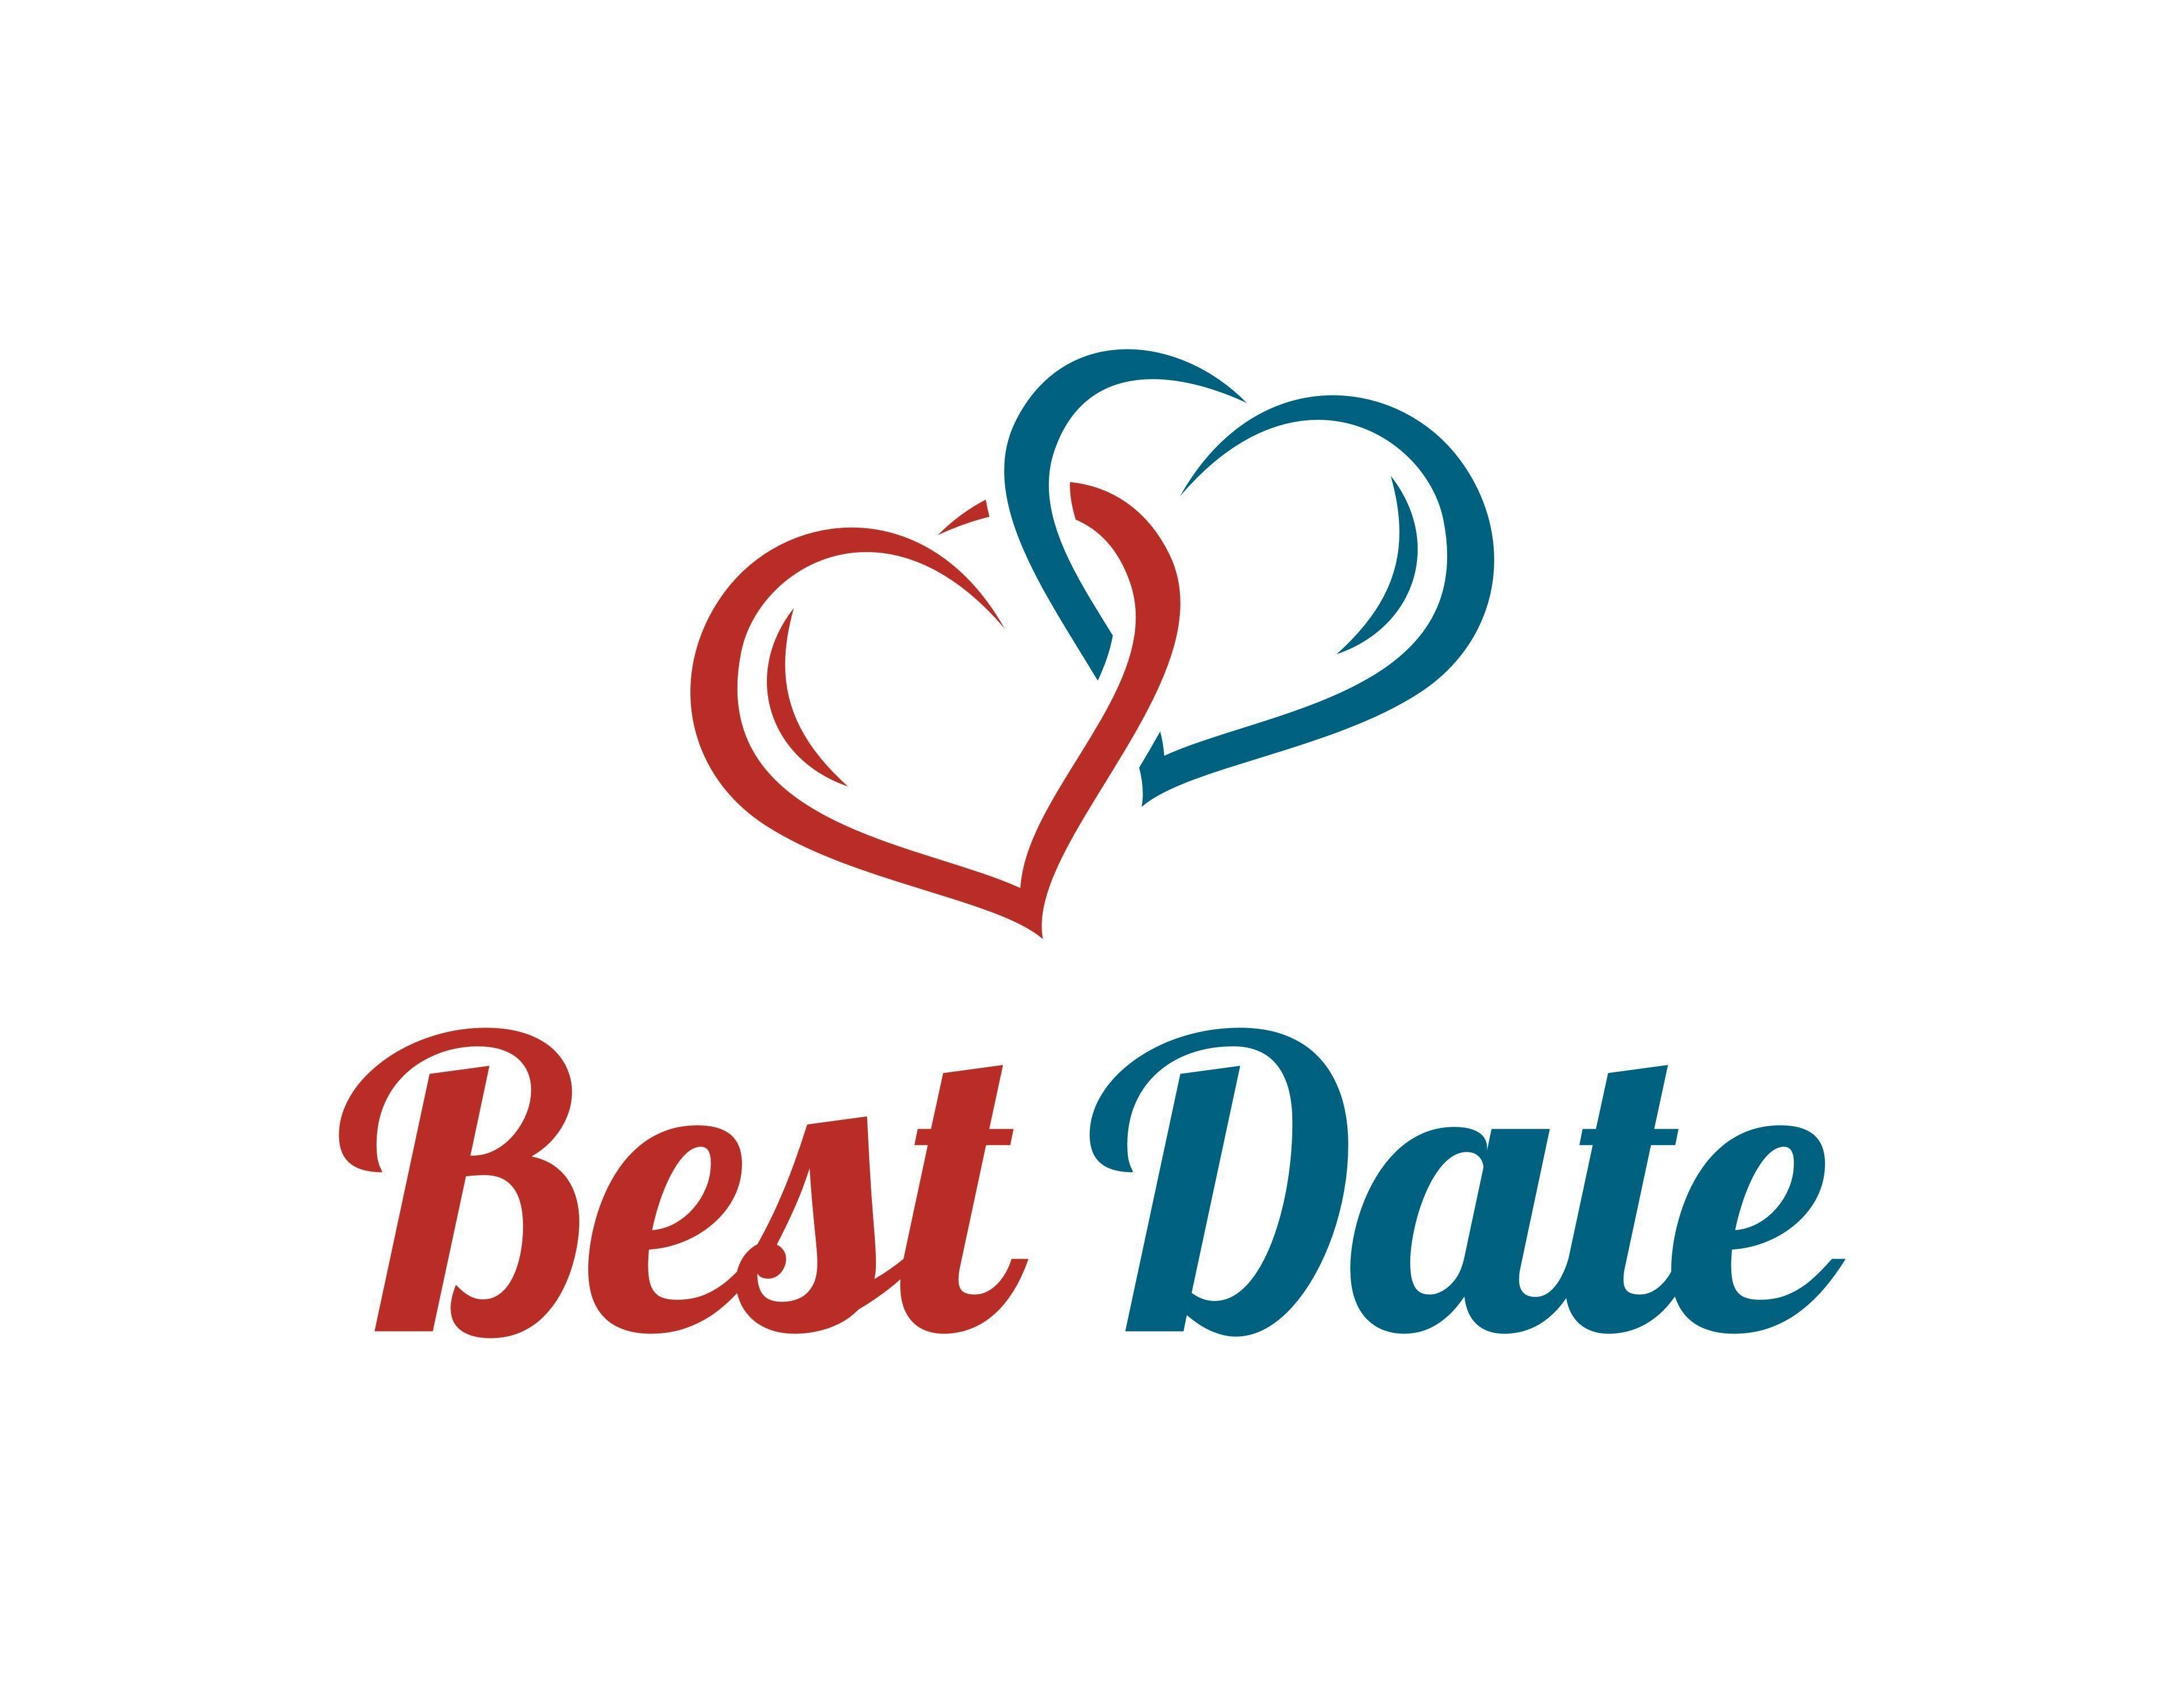 Dating nach songs.pk te downloaden